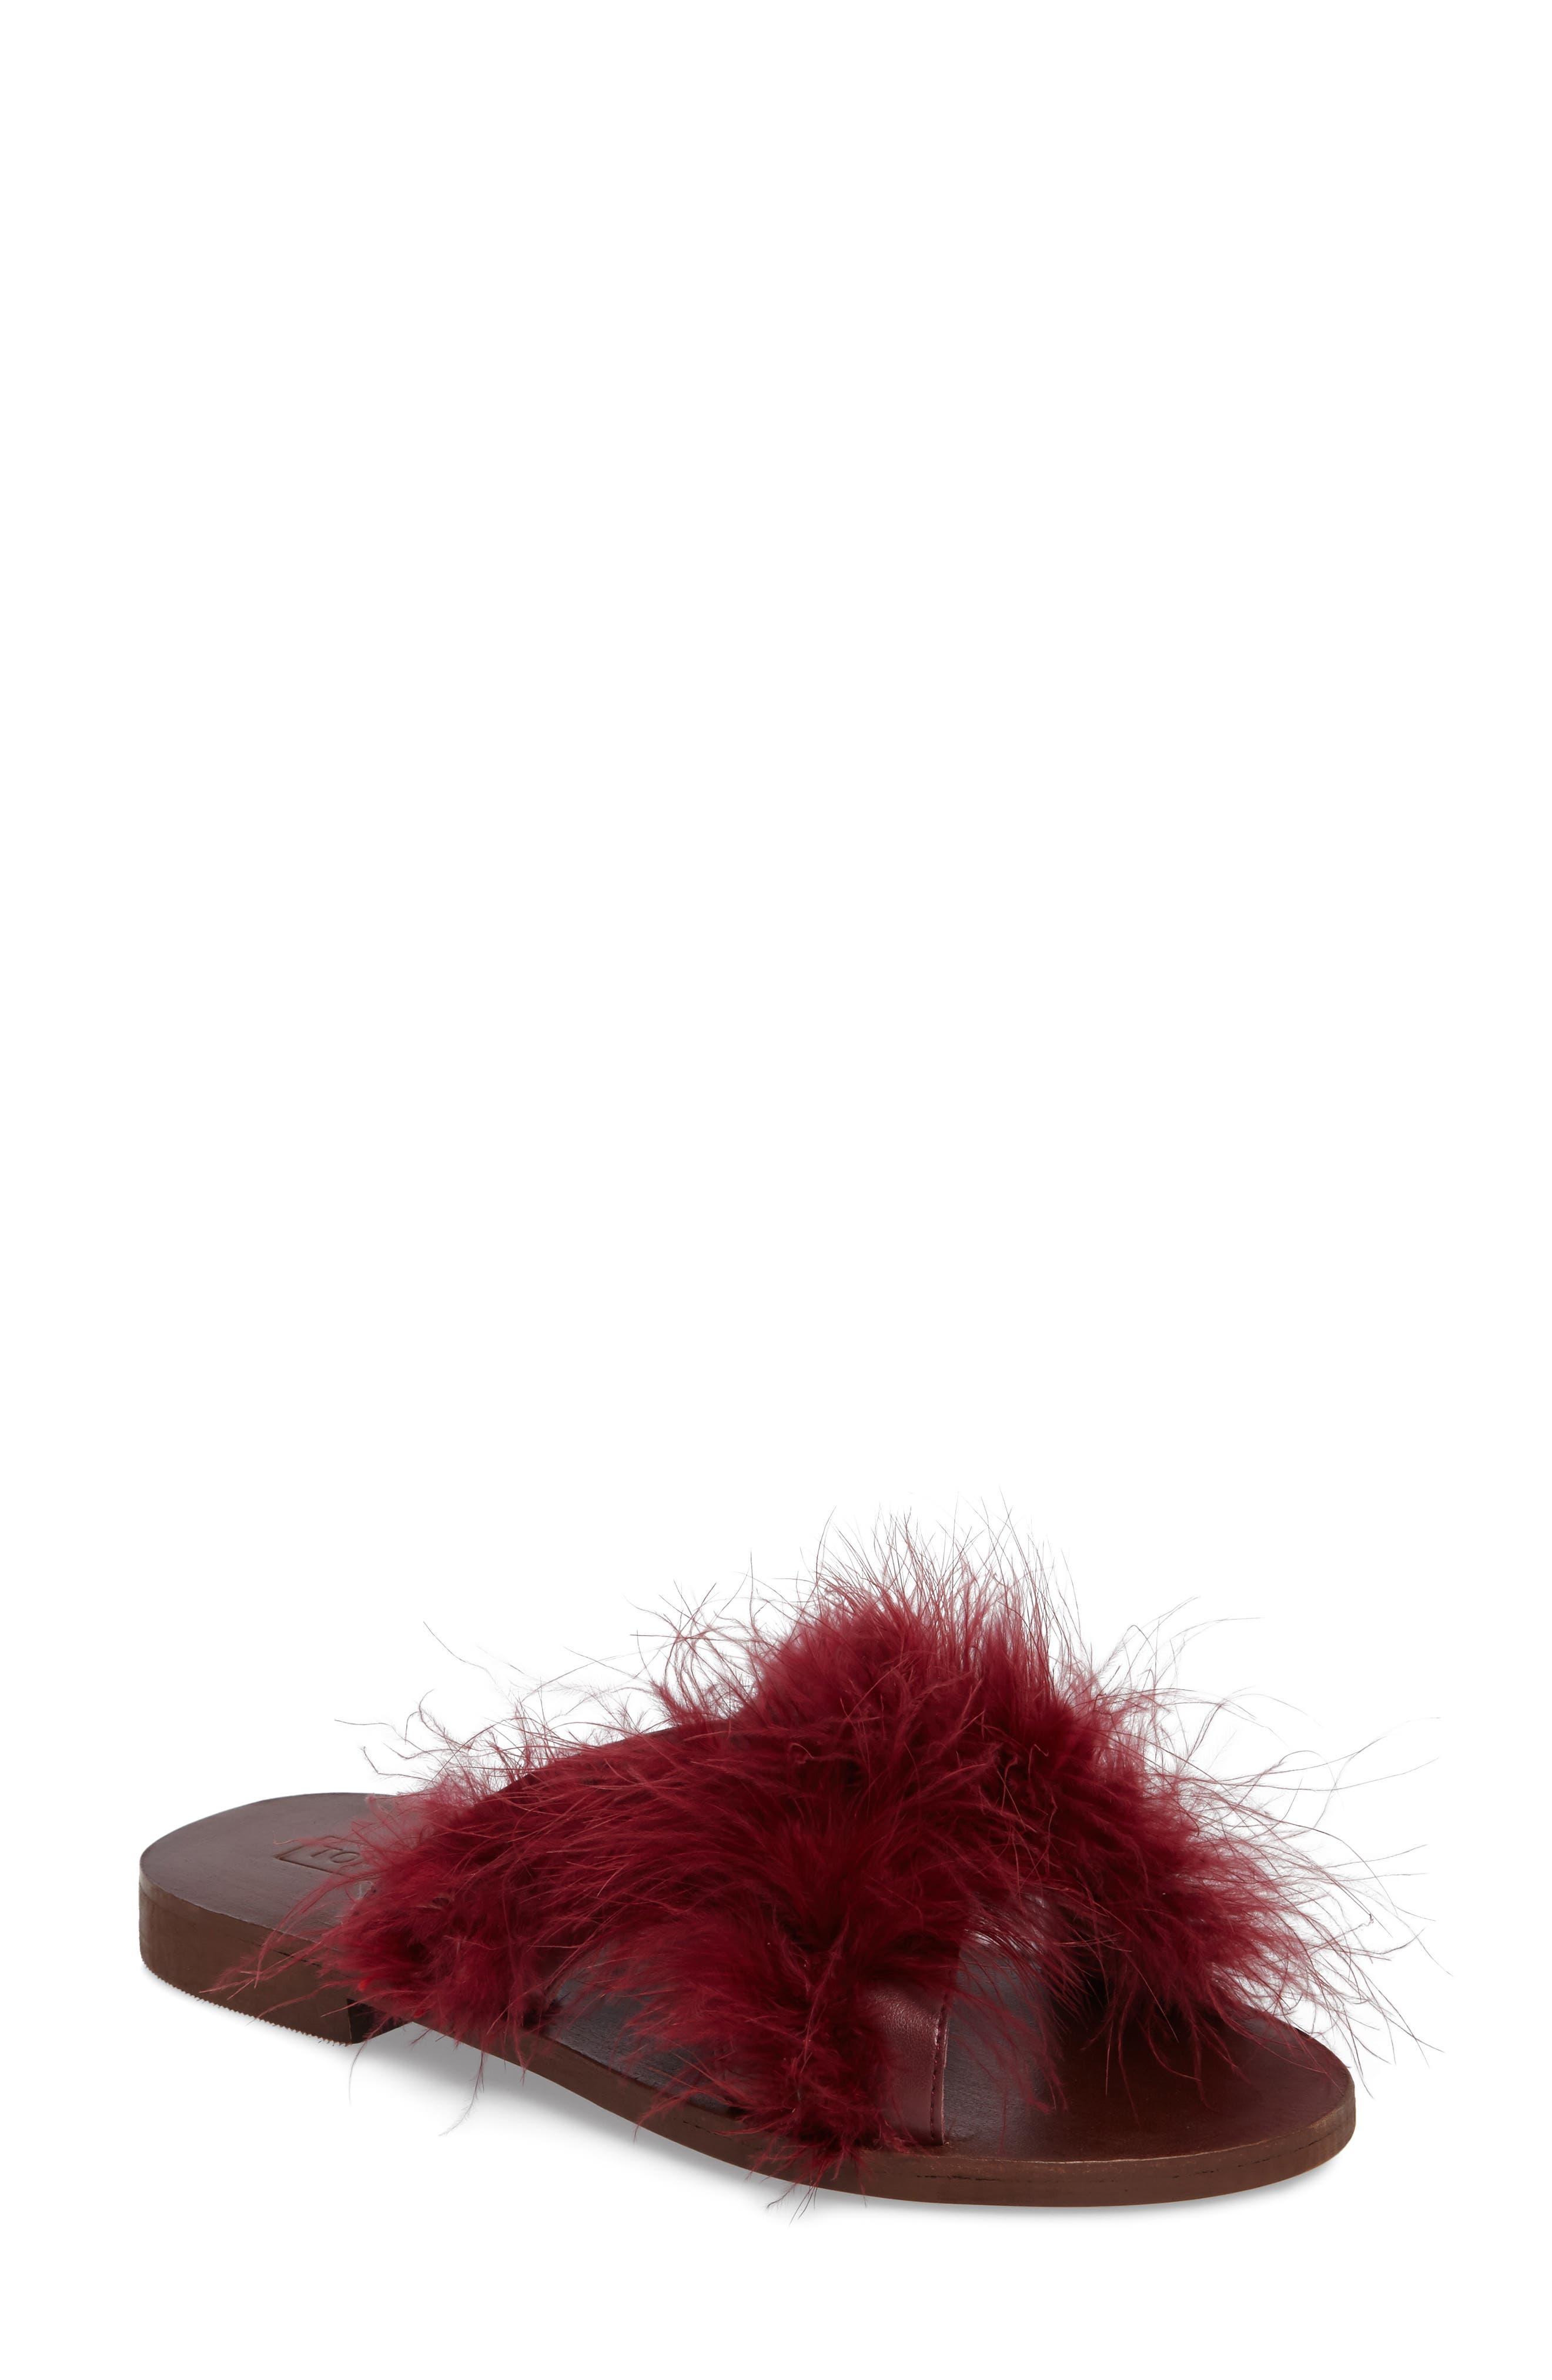 Main Image - Topshop Fenella Feathered Sandal (Women)